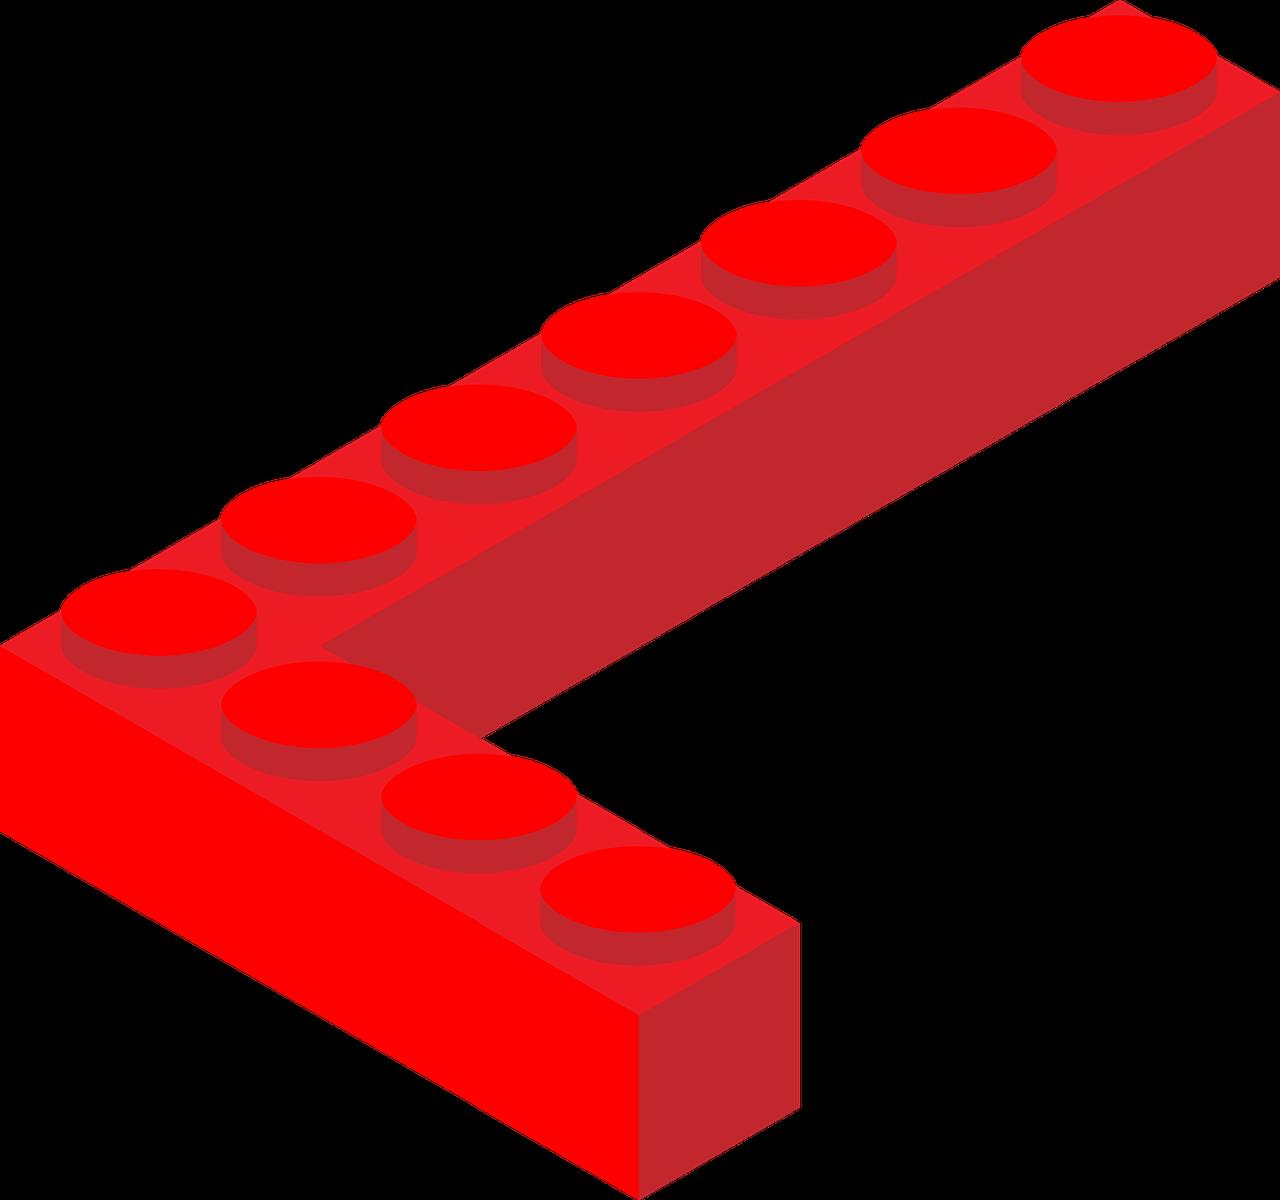 Letter alphabet transparent image. Markers clipart bingo marker